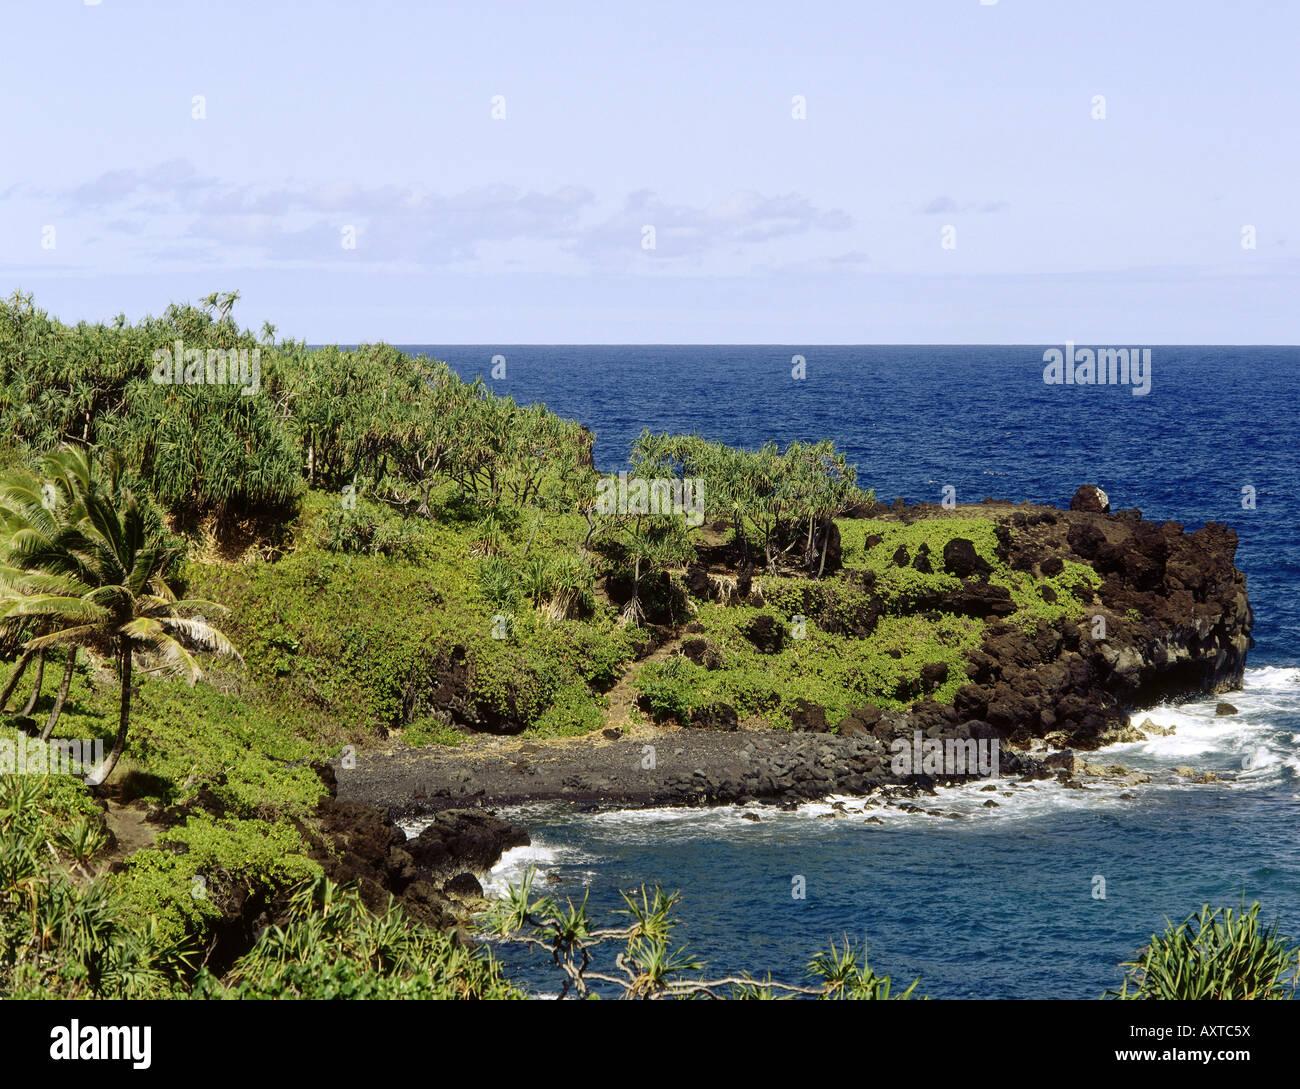 geography / travel, USA, Hawaii, Maui Island, Wainapanapa landscape, landscapes park, shoreline coast, coastline, Stock Photo